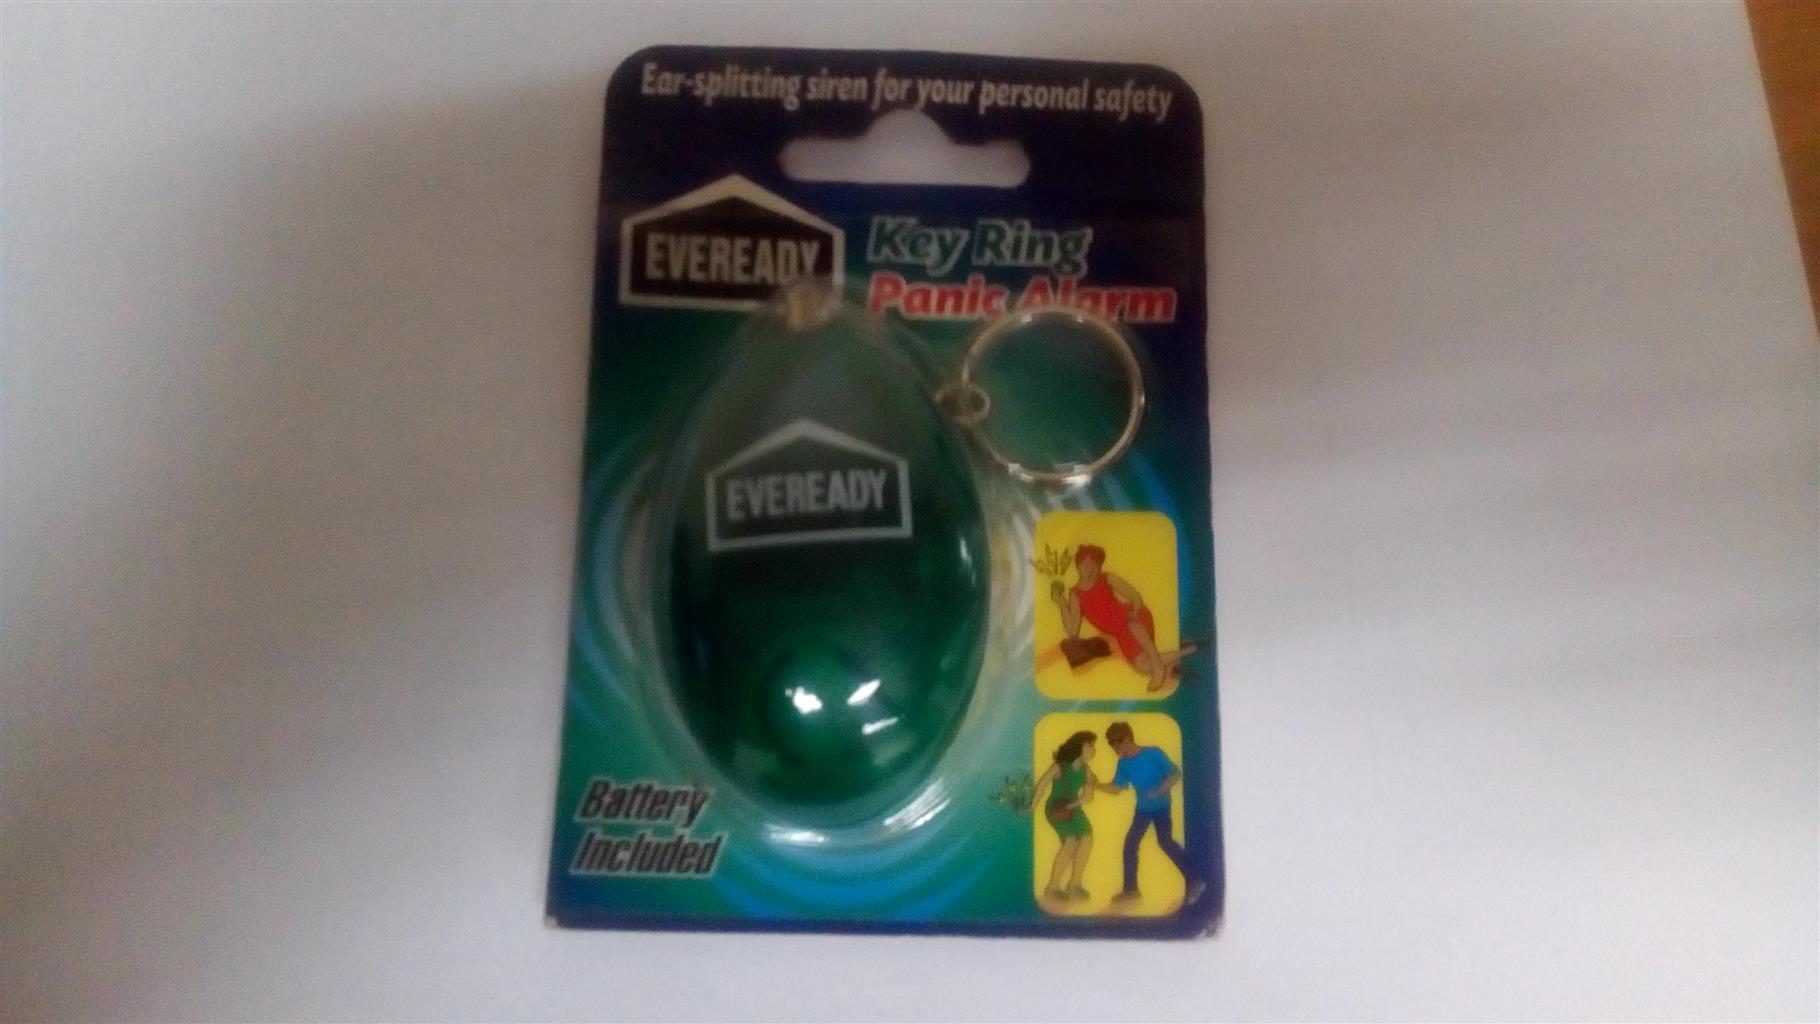 Eveready Key Ring Panic Alarm x 2 - New